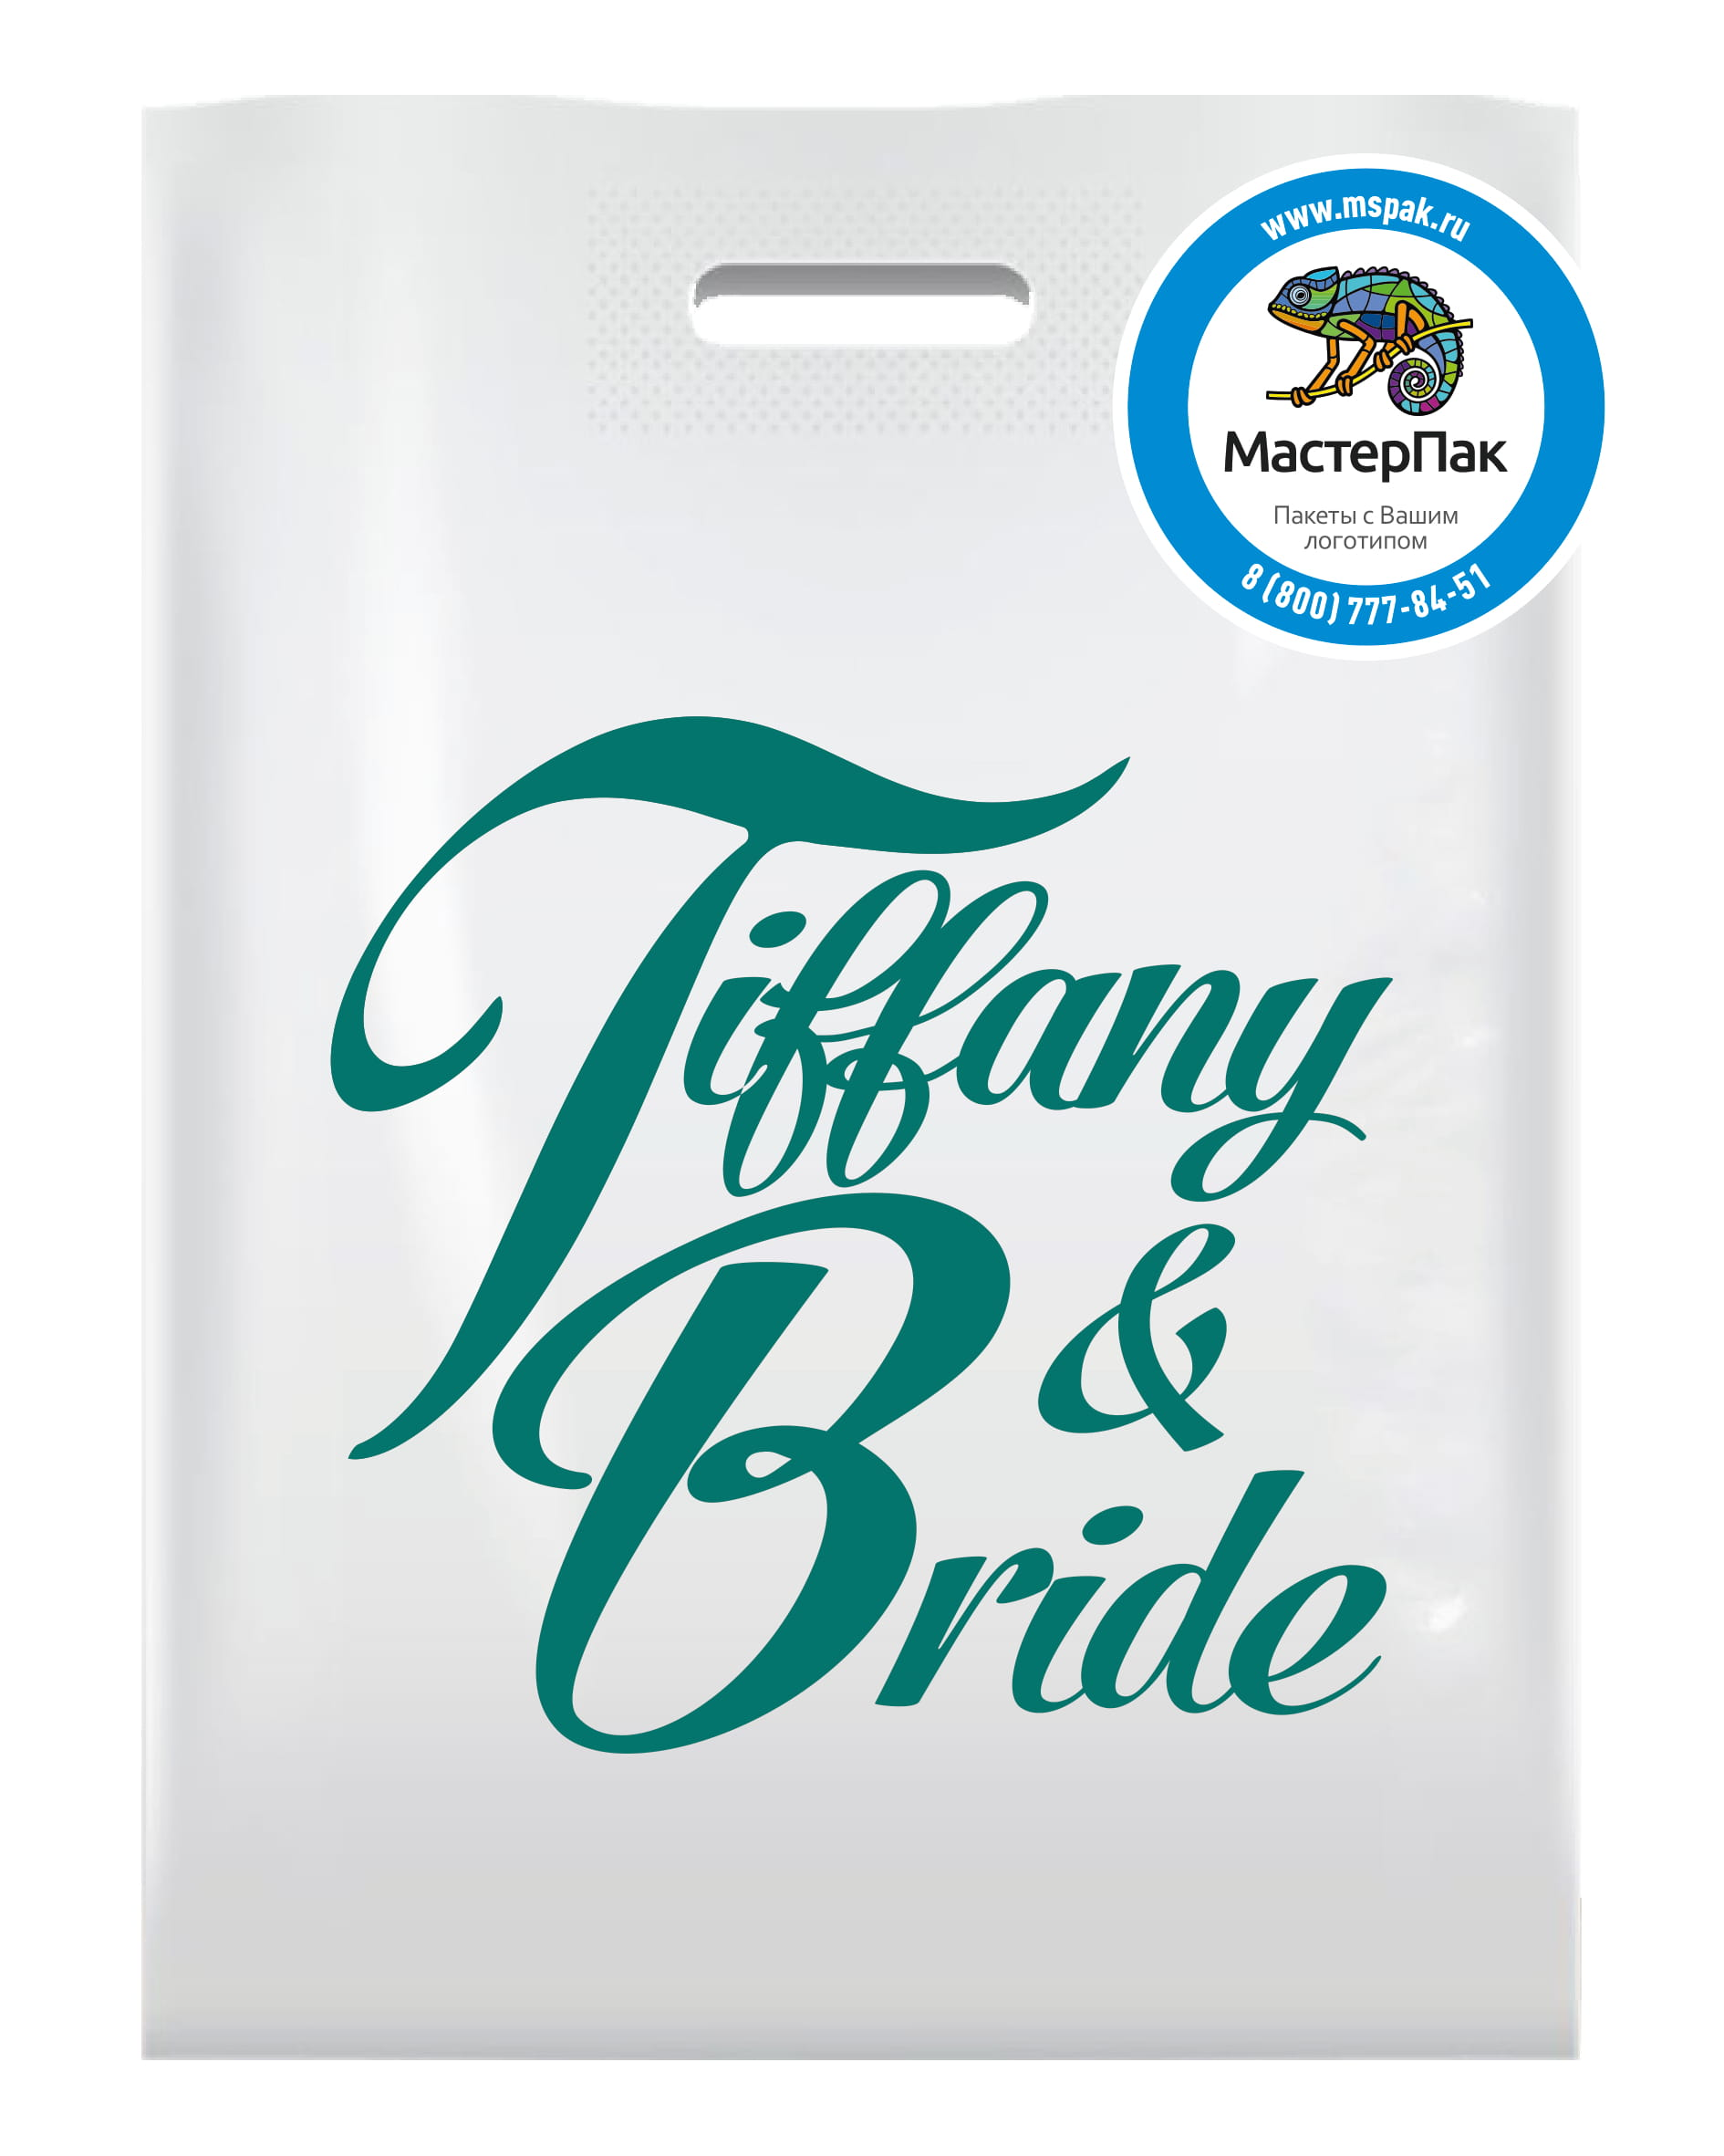 Пакет ПВД с логотипом Tiffany and Bride, Москва, 70 мкм, 36*45